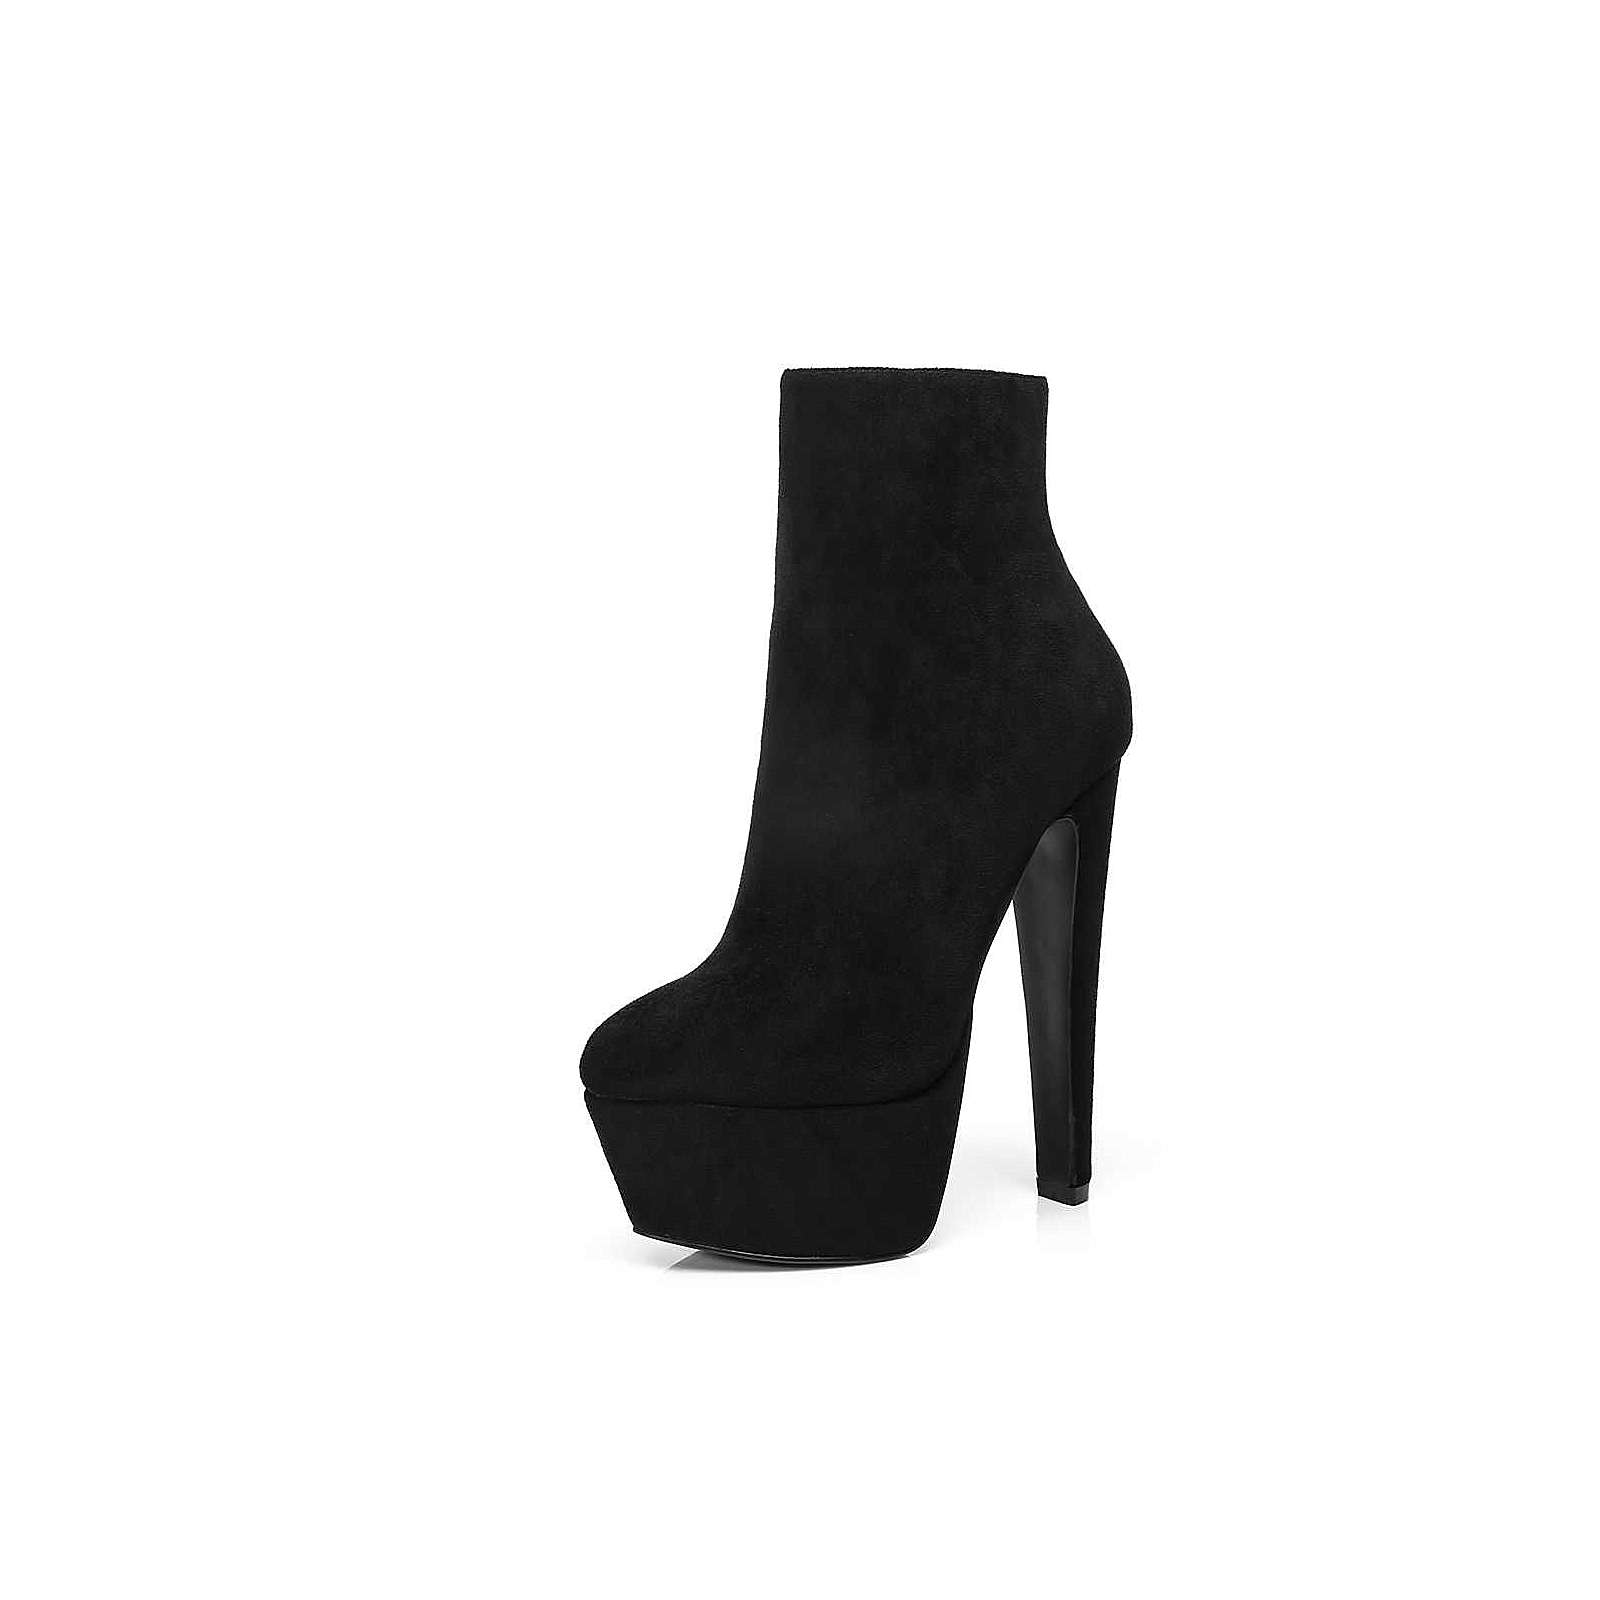 Giaro Ankleboots Selena Klassische Stiefeletten schwarz Damen Gr. 44